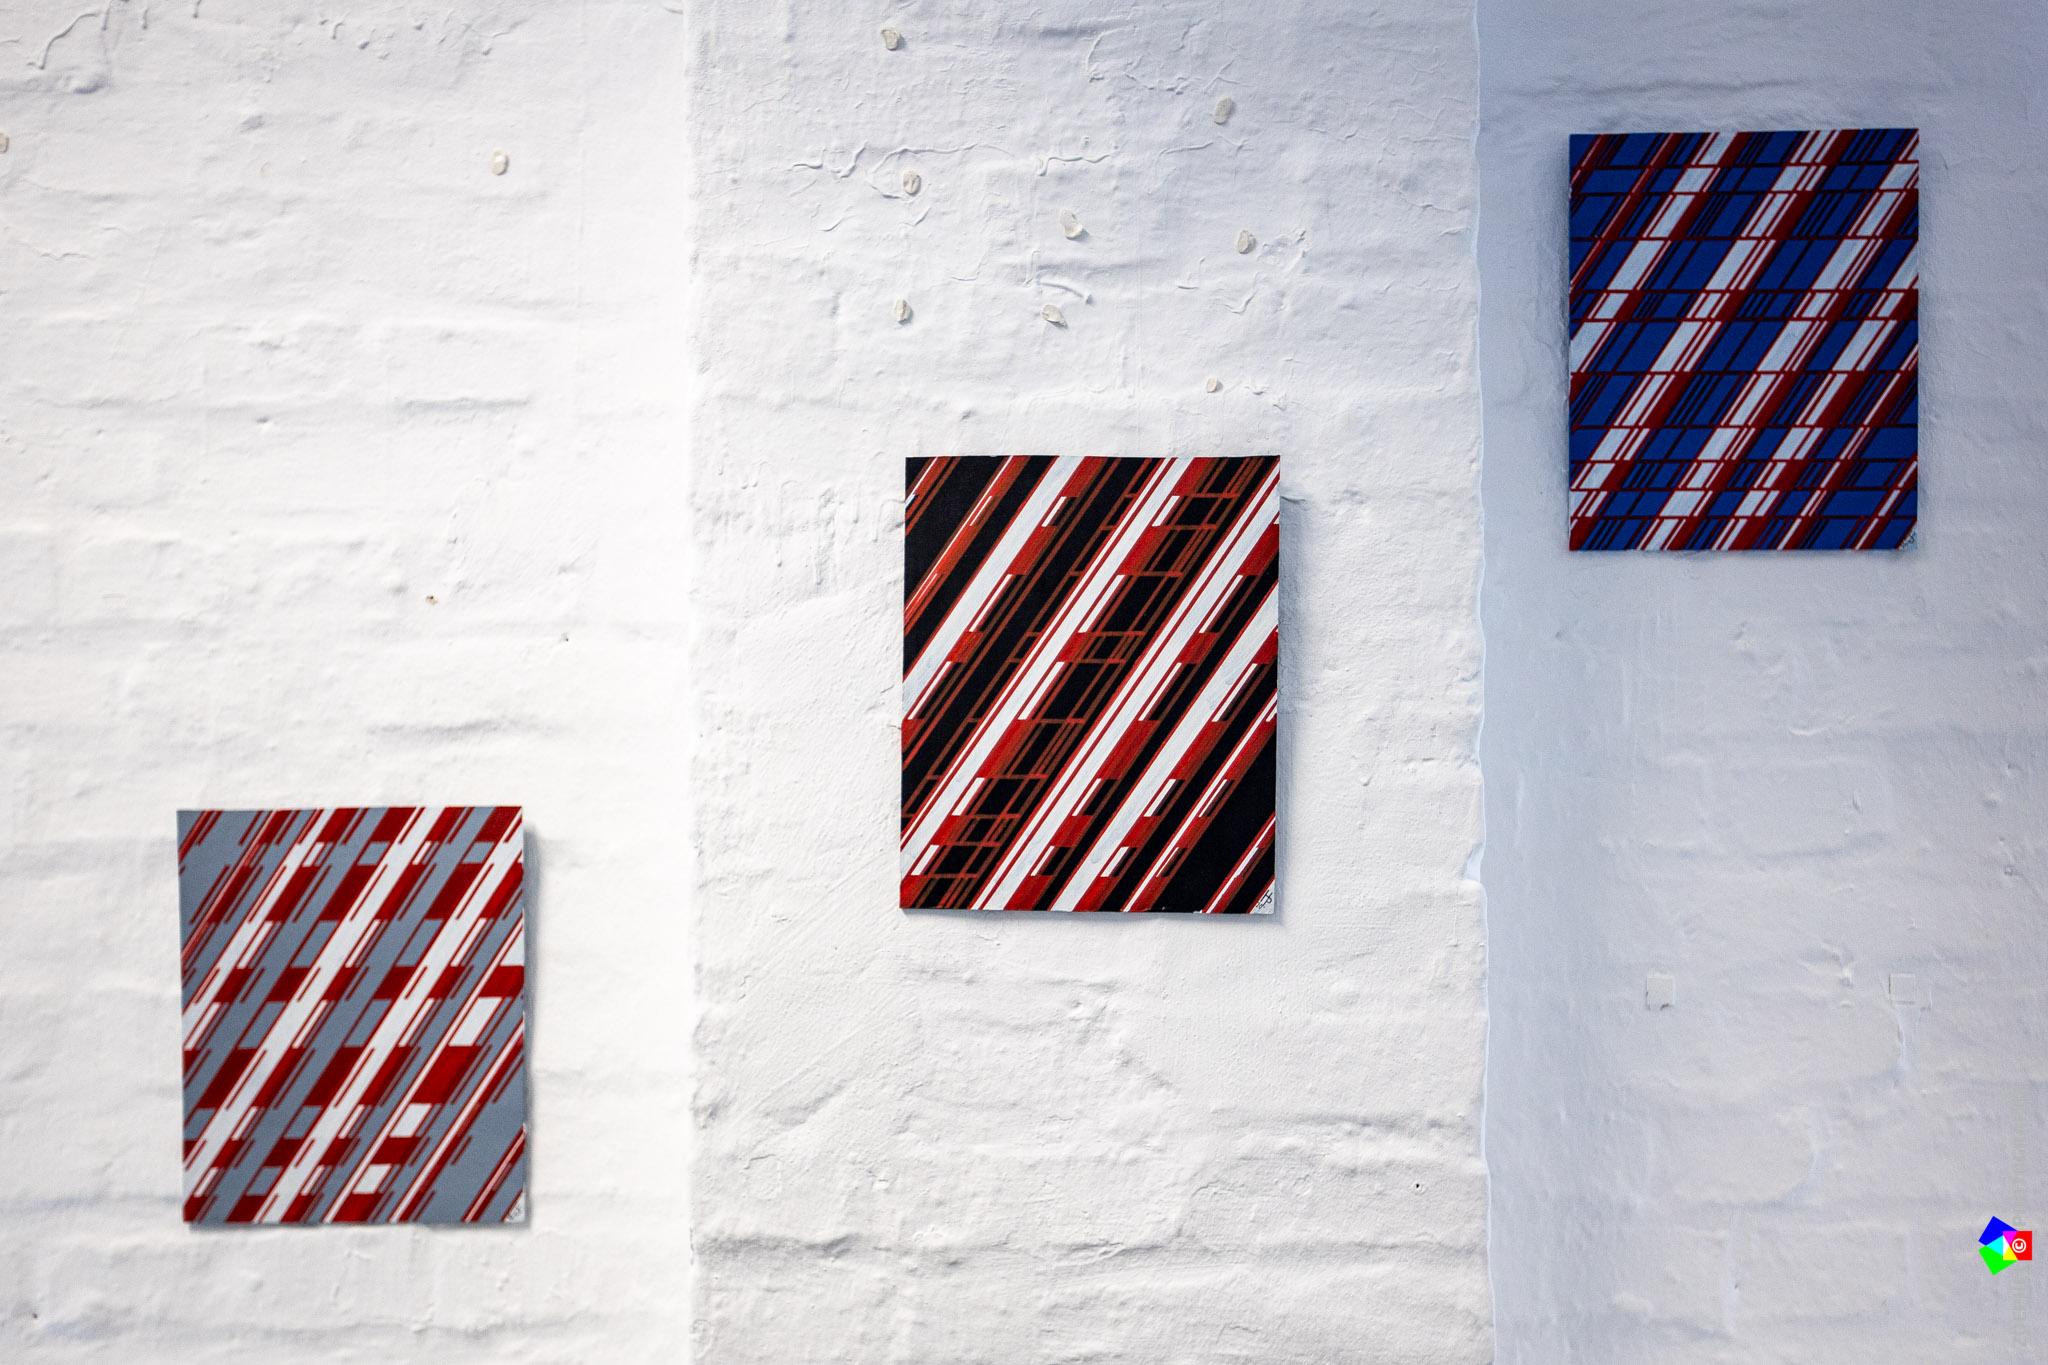 Hubertus Peters – Rot trifft - grau-blau-schwarz